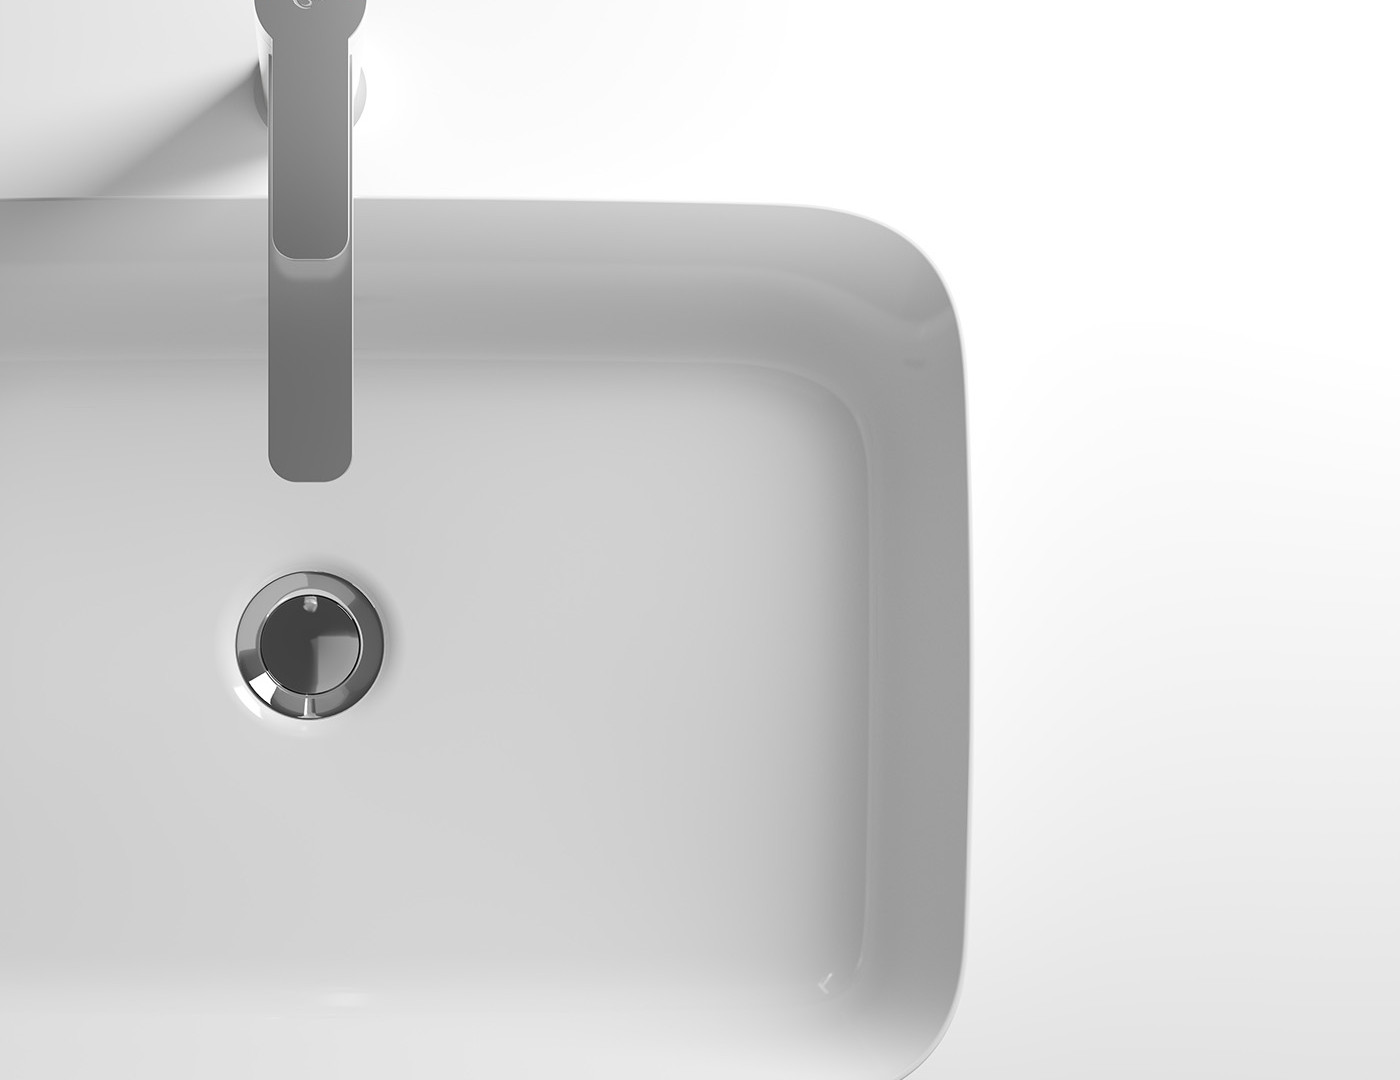 Ideal Standard rendering